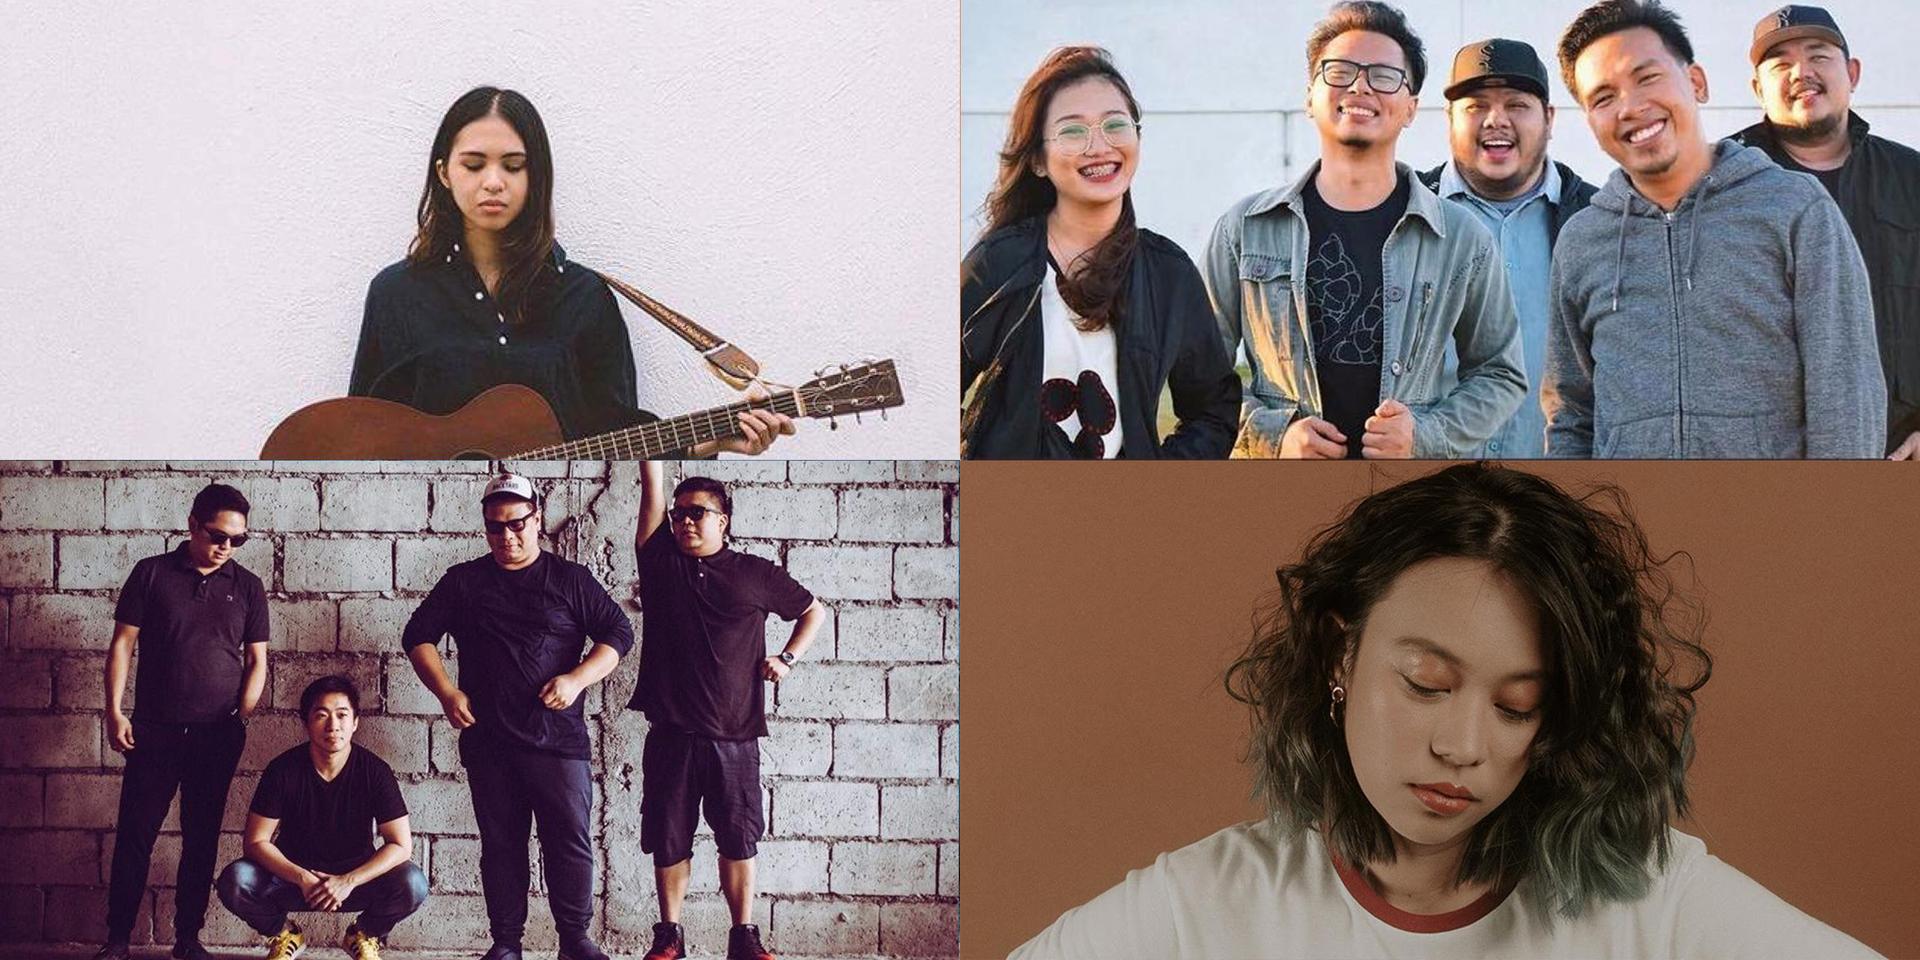 The Itchyworms, Mayonnaise, Clara Benin and more set to perform at Tagaytay Art Beat 3